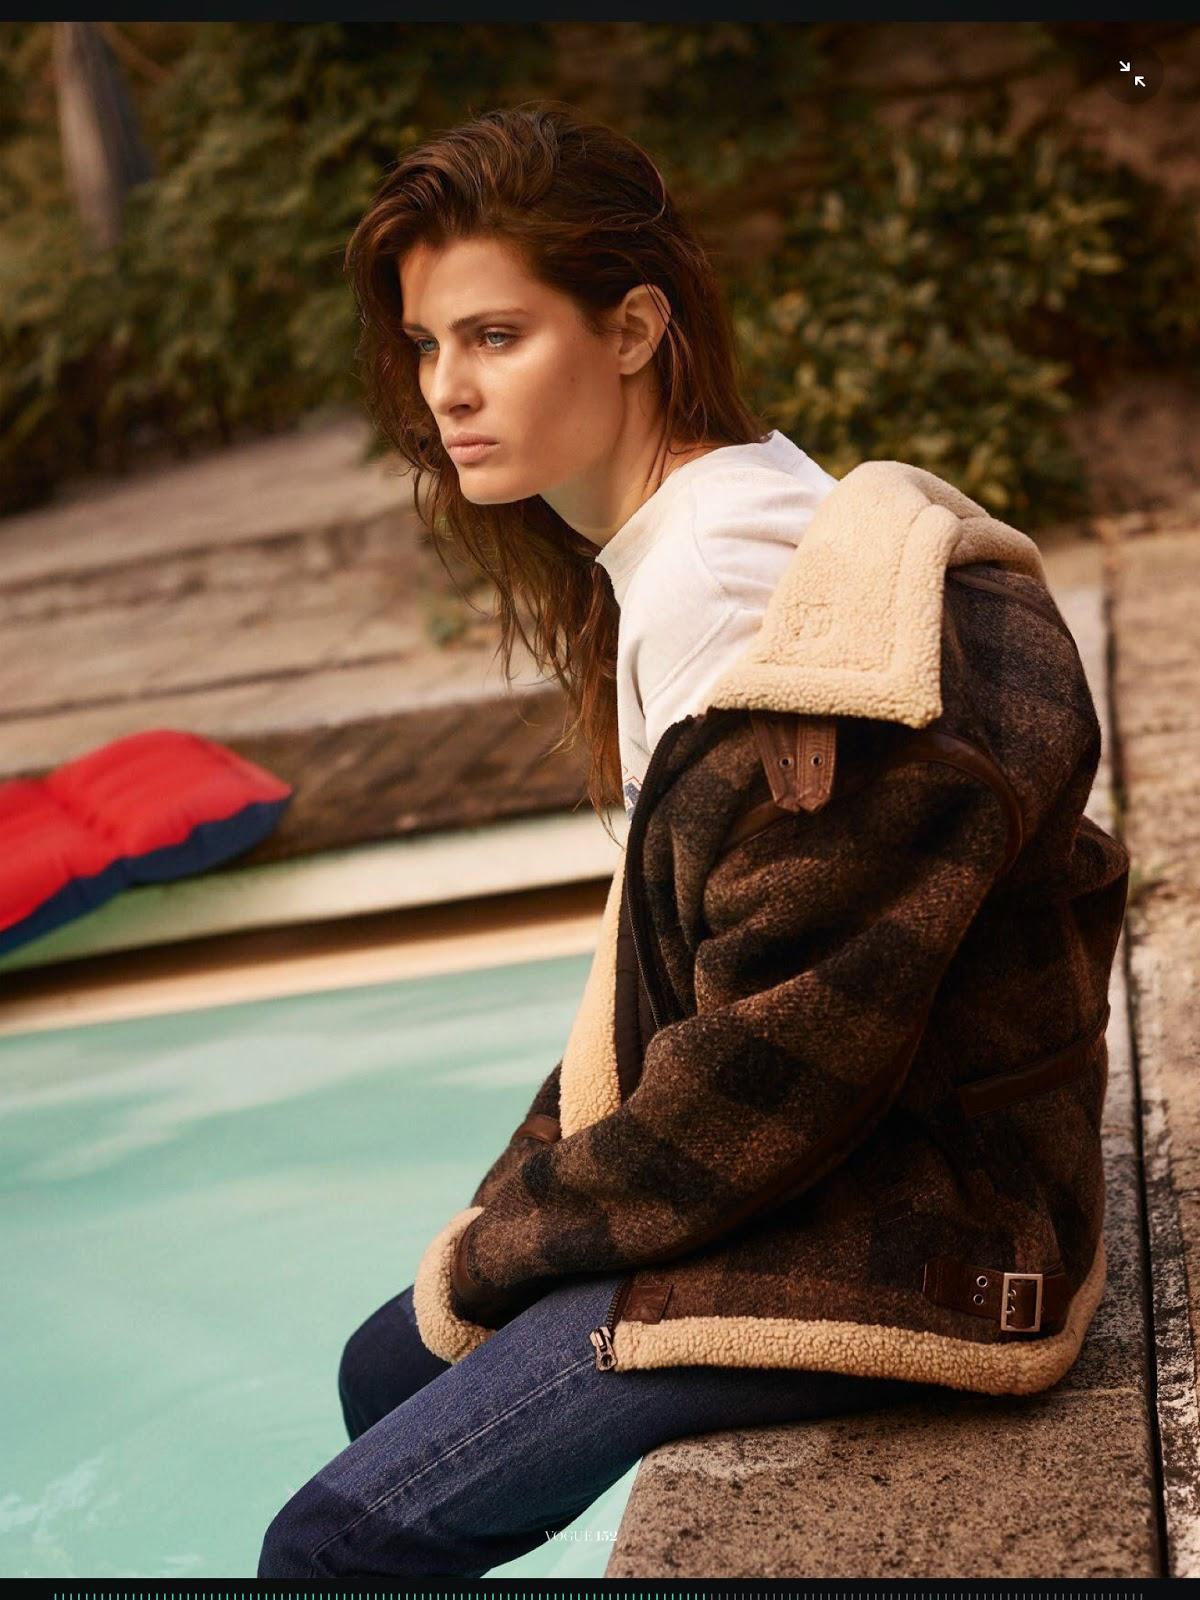 Clochet_Isabeli _Fontana _for _Vogue _Paris _November _2014_photography_by_Scott_Trindle_styling_Geraldine_Saglio_07